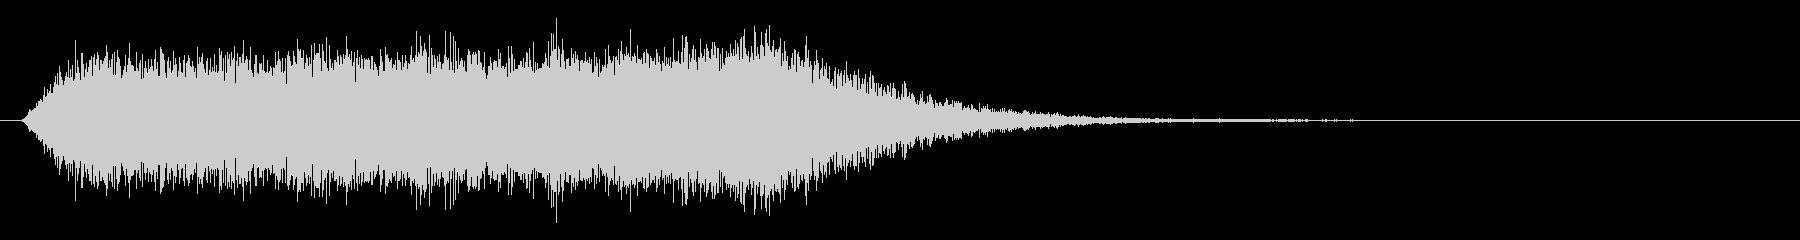 Bulgarian Voice Jingle's unreproduced waveform